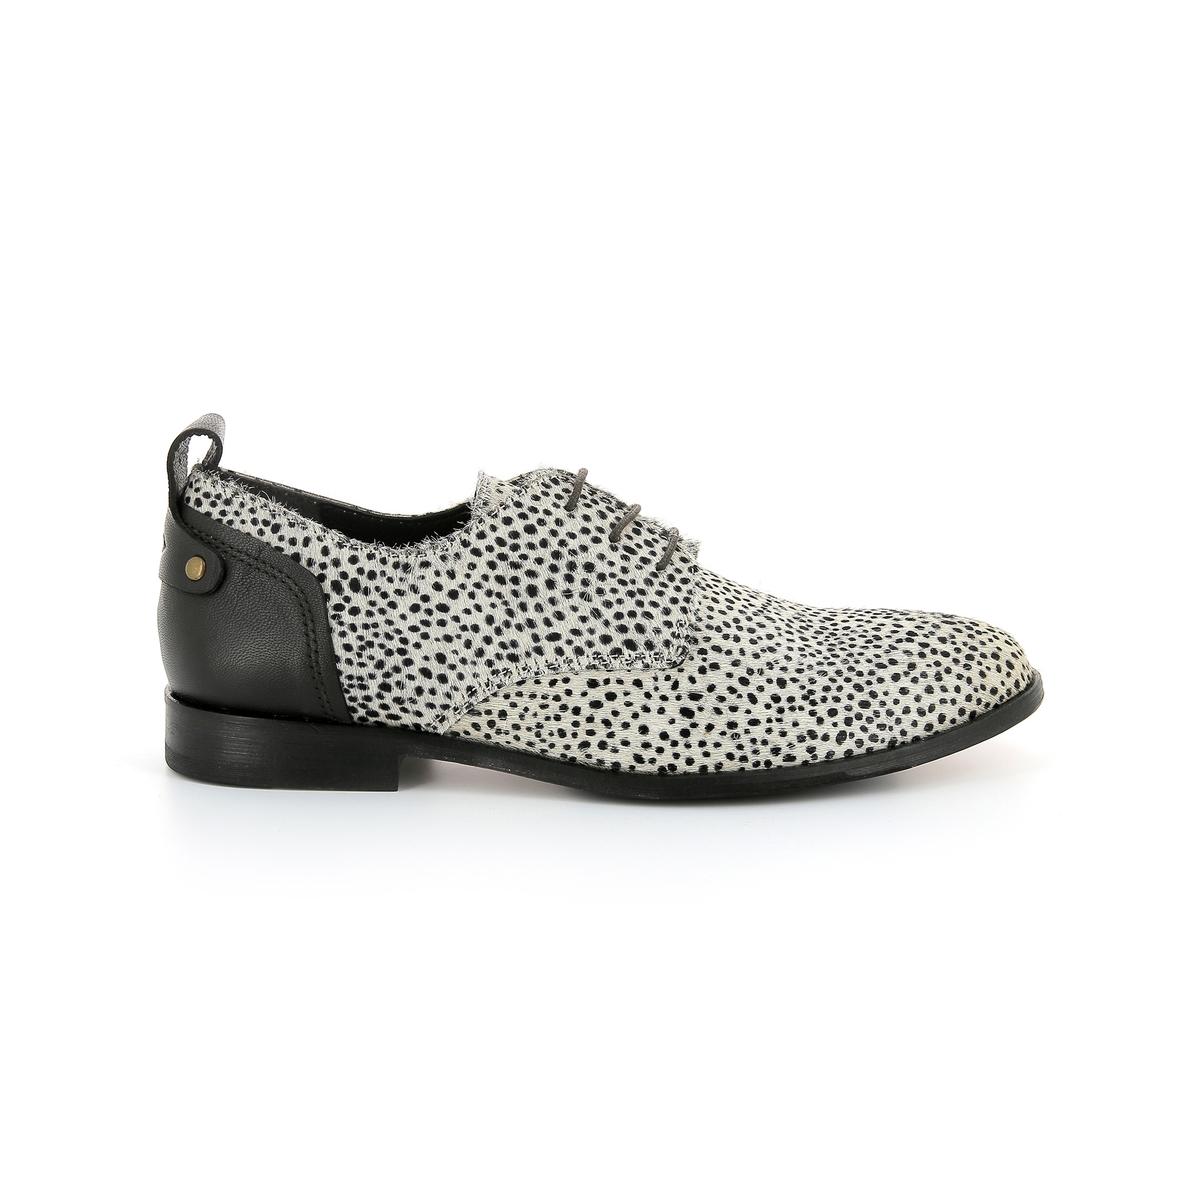 Ботинки-дерби из кожи Picadilly ботинки дерби из мягкой кожи takarika